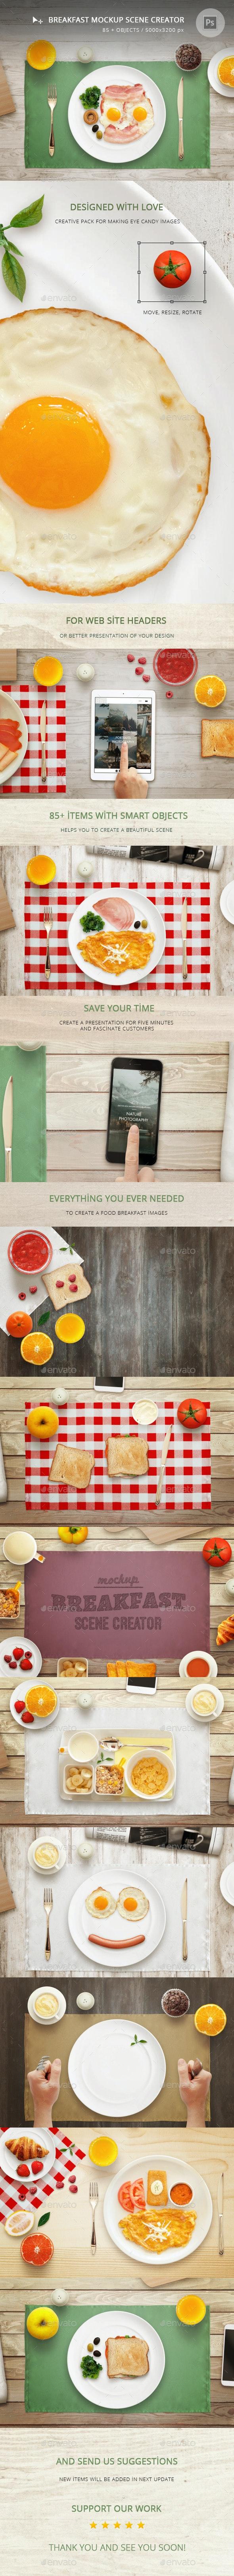 Breakfast Mockup Scene Creator - Hero Images Graphics